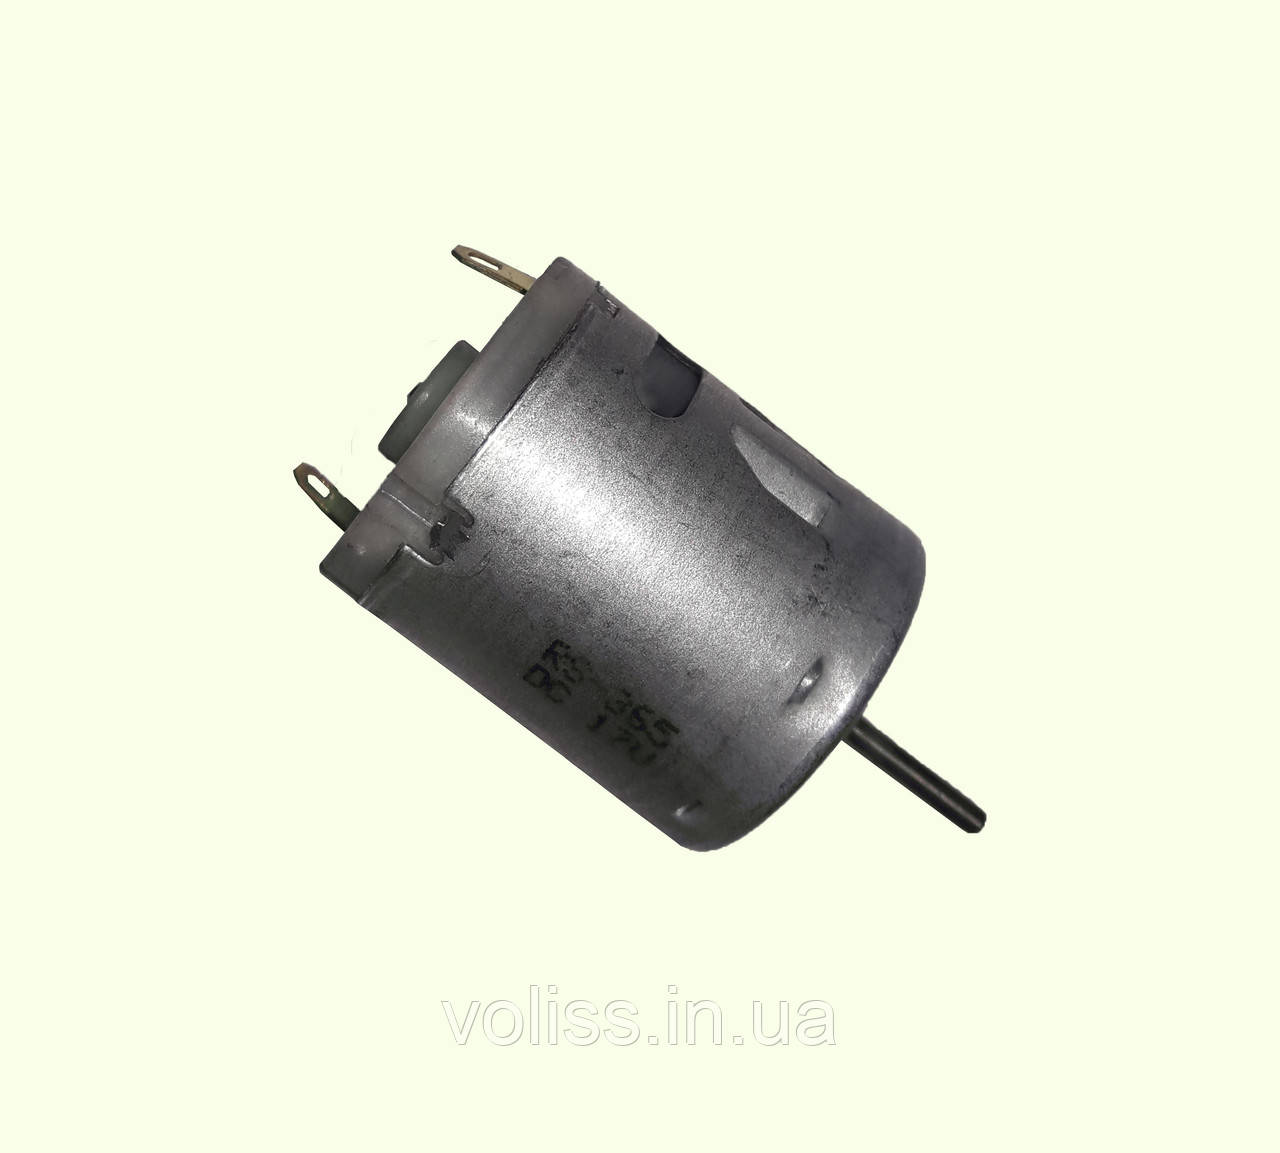 Двигатель на фен Зенит